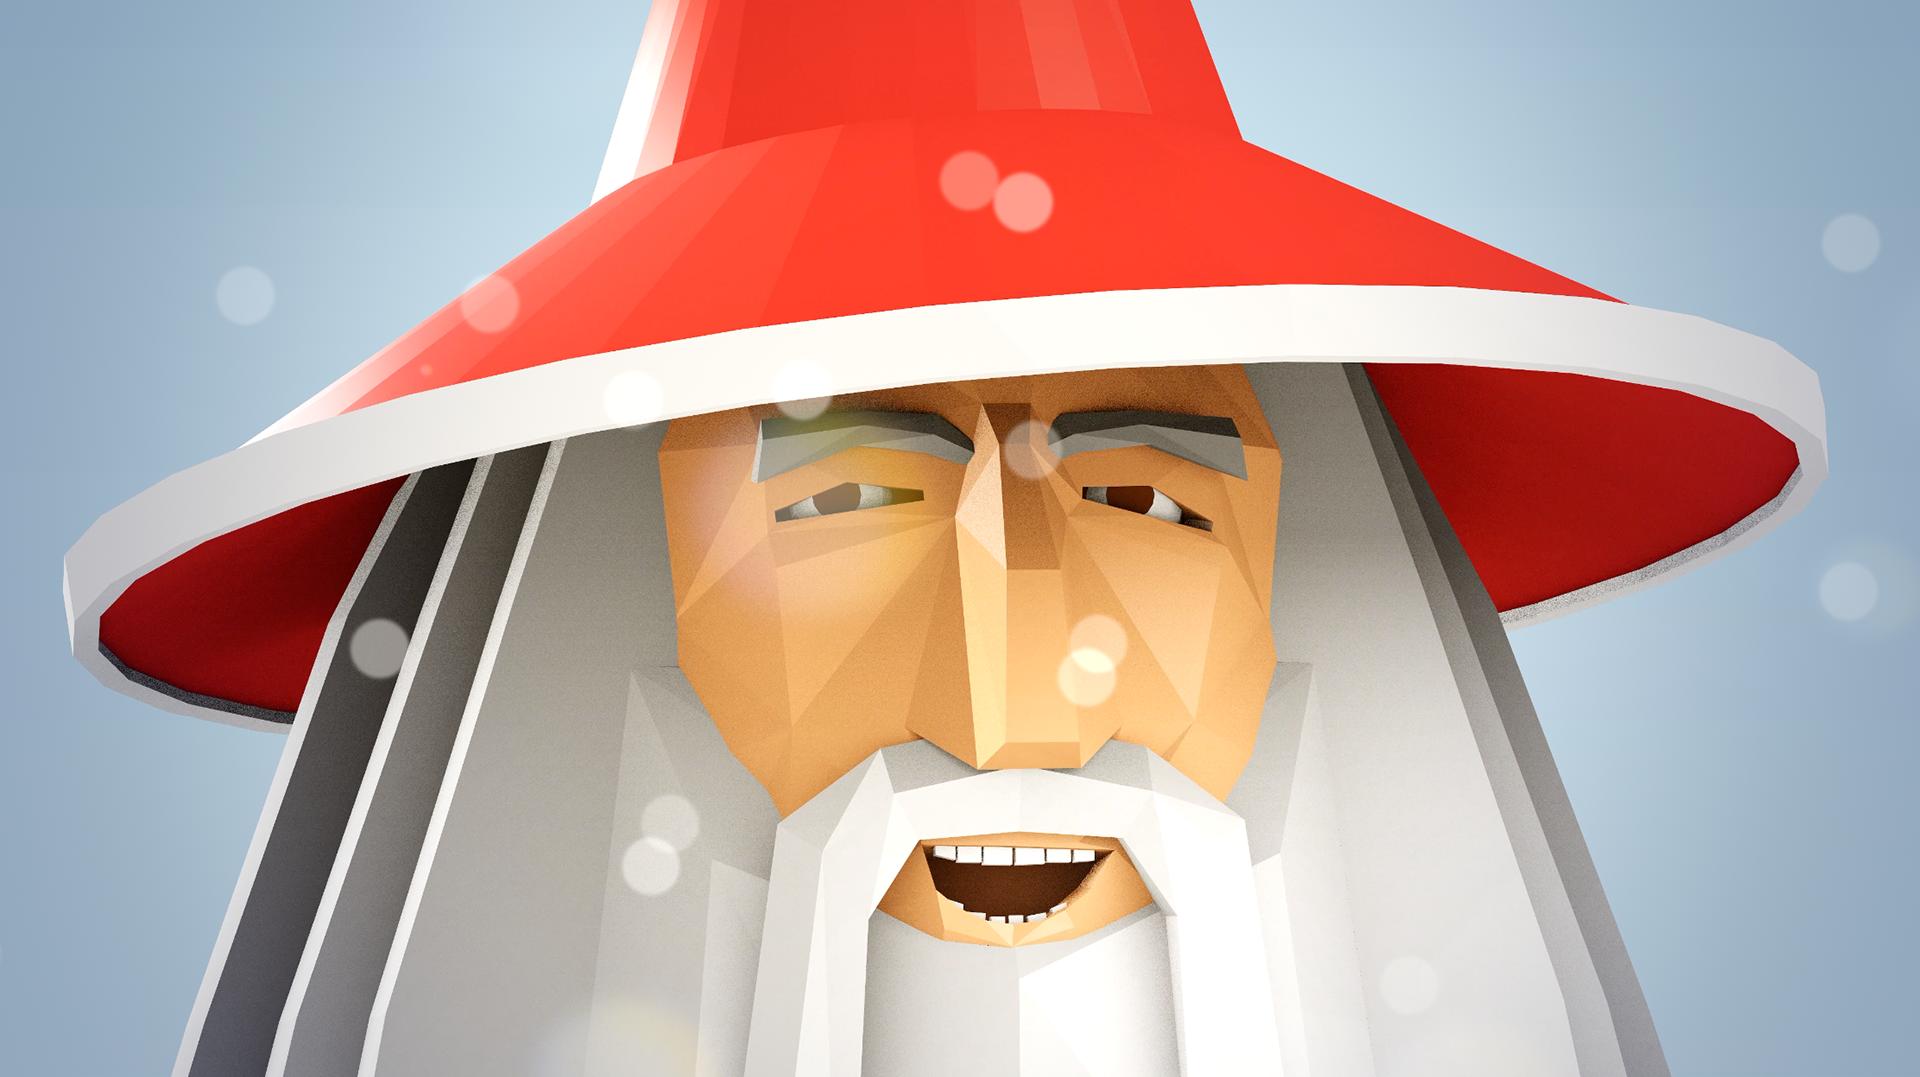 Santa Gandalf Epic Xmas on Behance